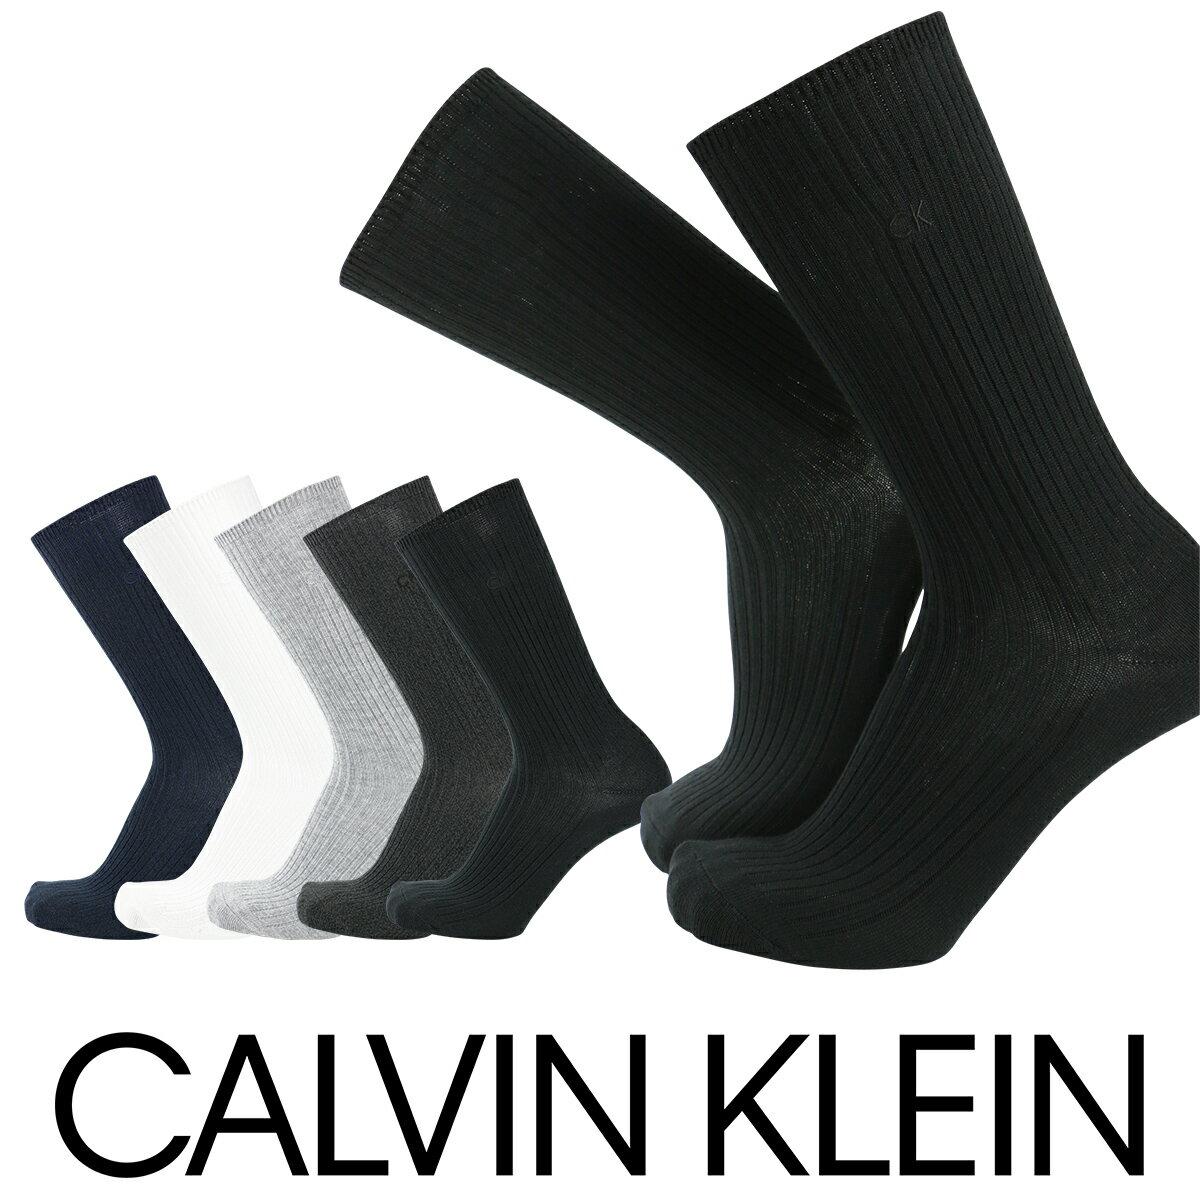 Calvin Klein ( カルバンクライン )カジュアル ロゴ刺繍(片面刺繍) ウール混リブ クルー丈 ソックス メンズ ソックス 男性 メンズ プレゼント 贈答 ギフト2542-181ポイント10倍